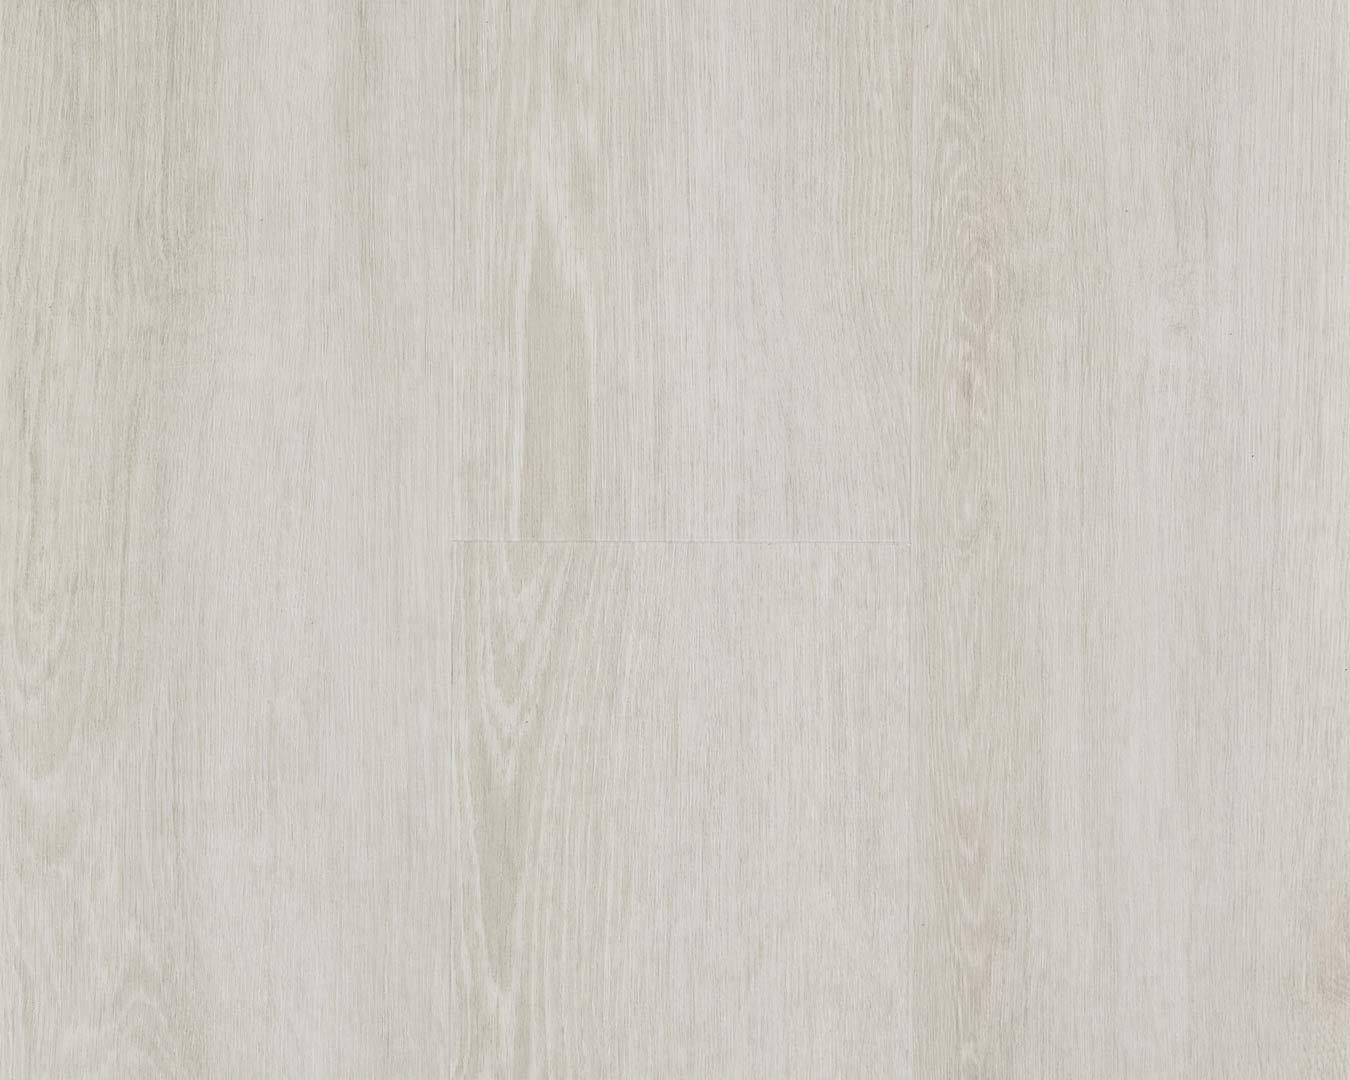 Rigid-Vinylboden - Toulon Oak - Ansicht 1